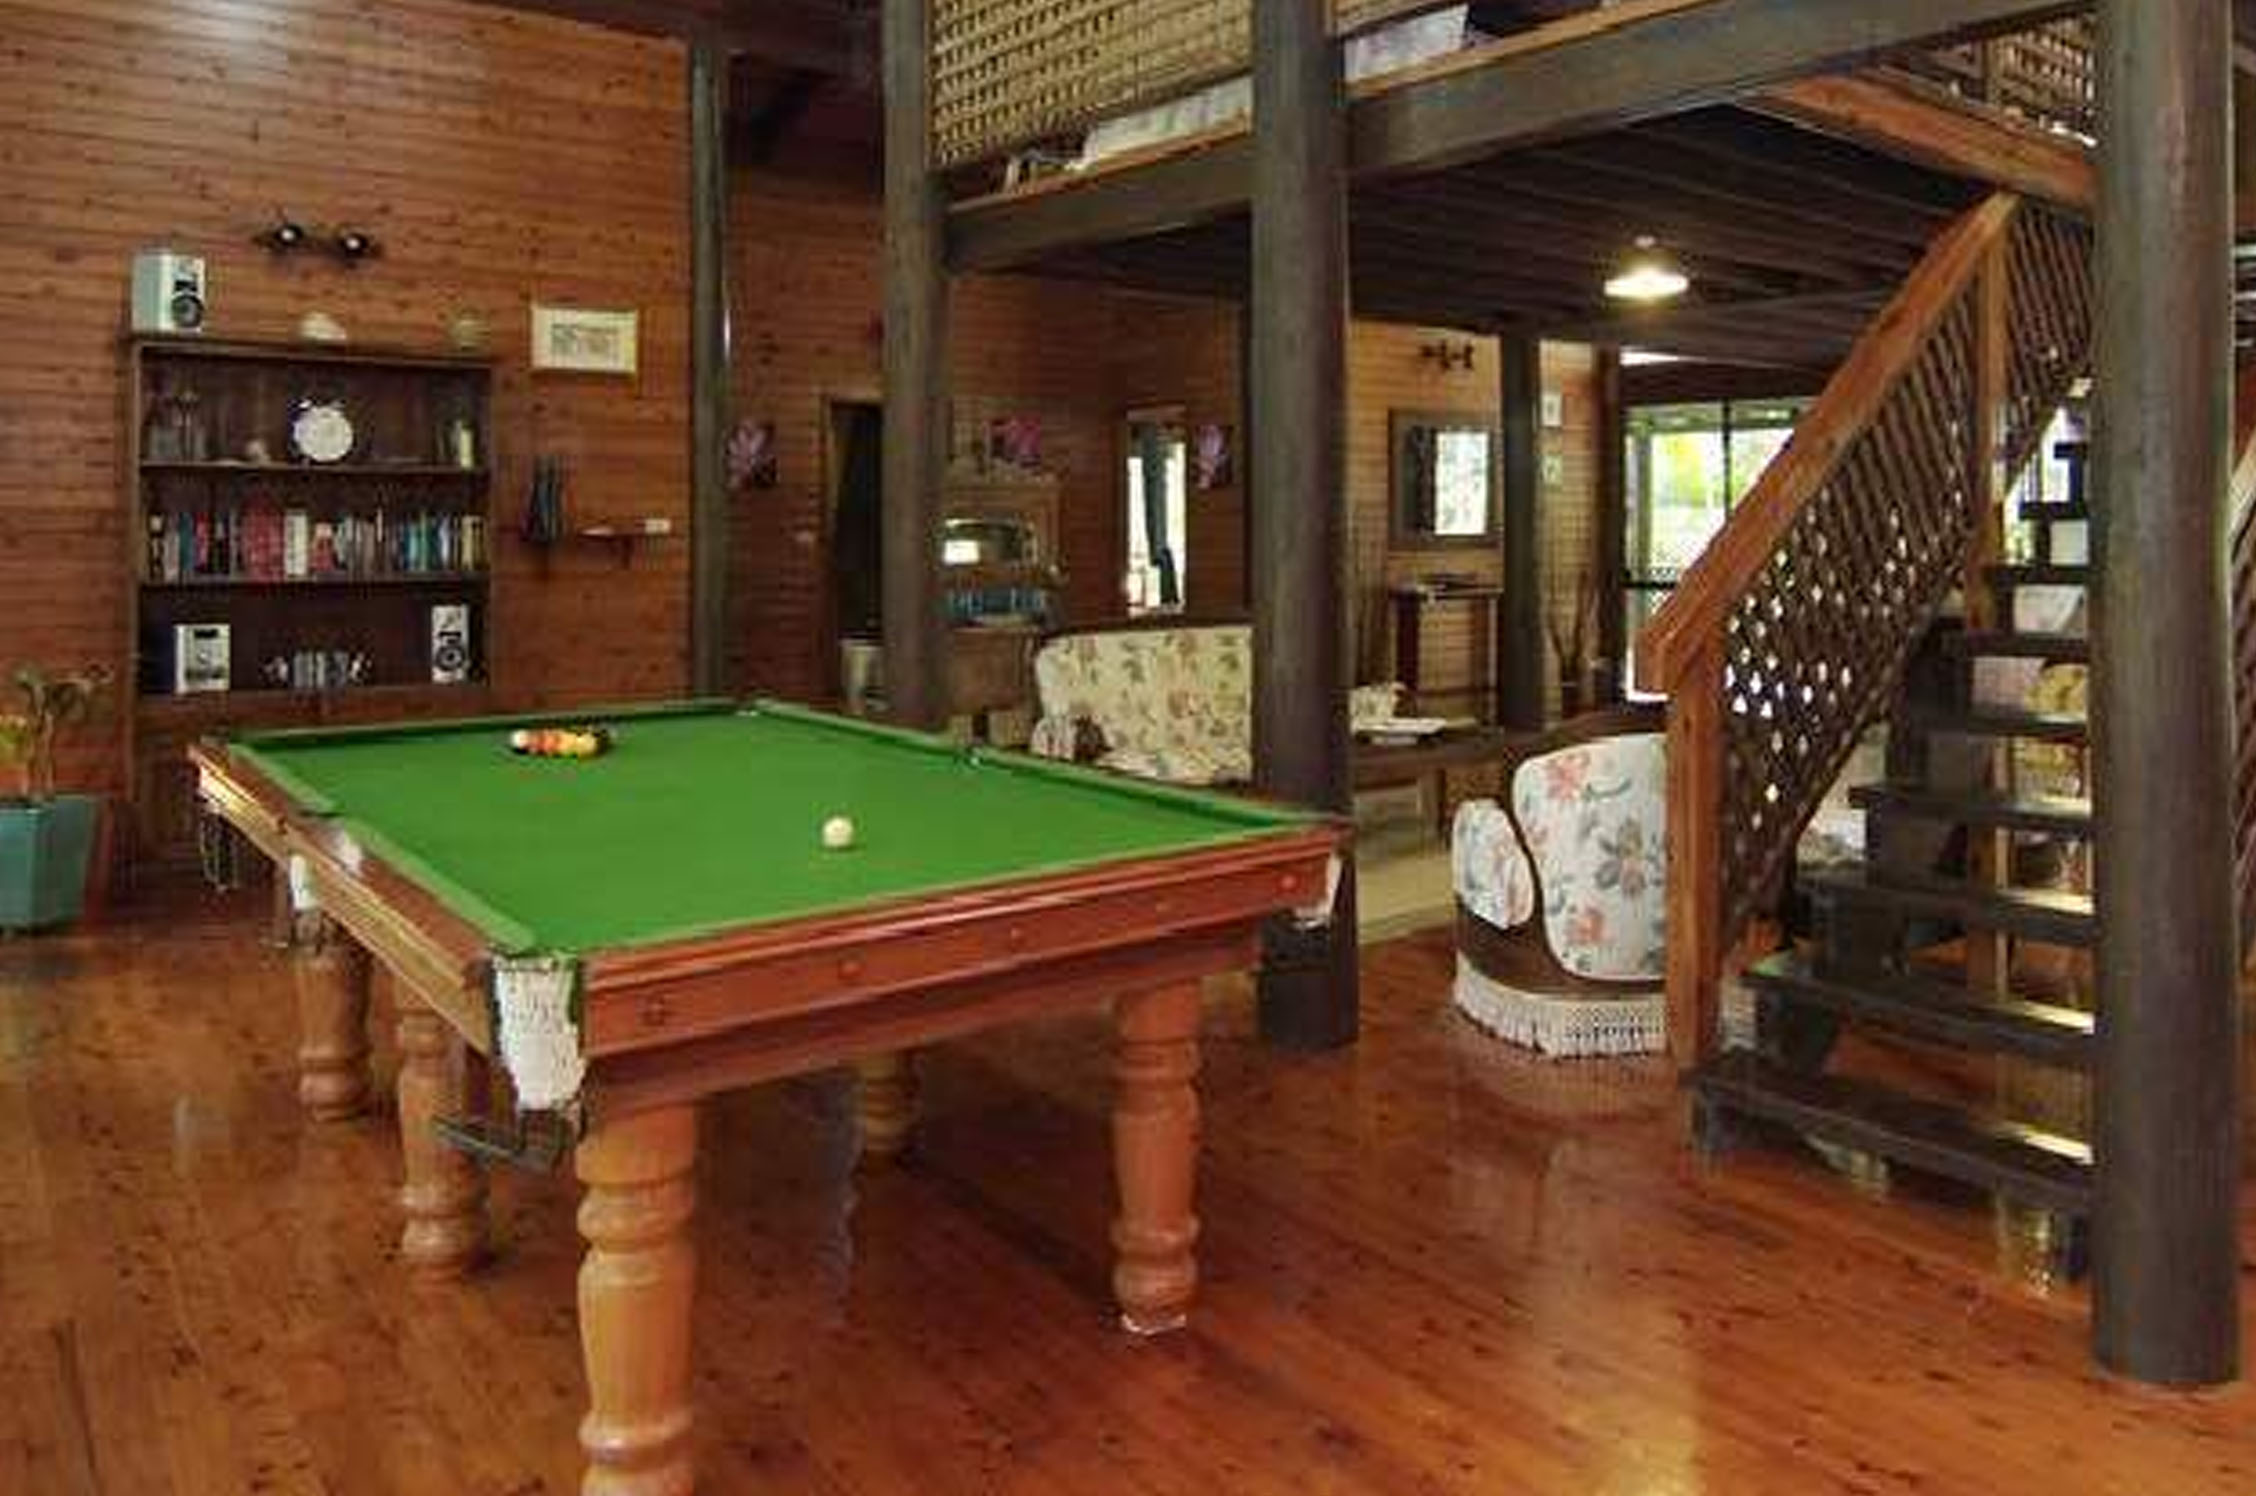 pool-table-billiards_0002_Layer 6